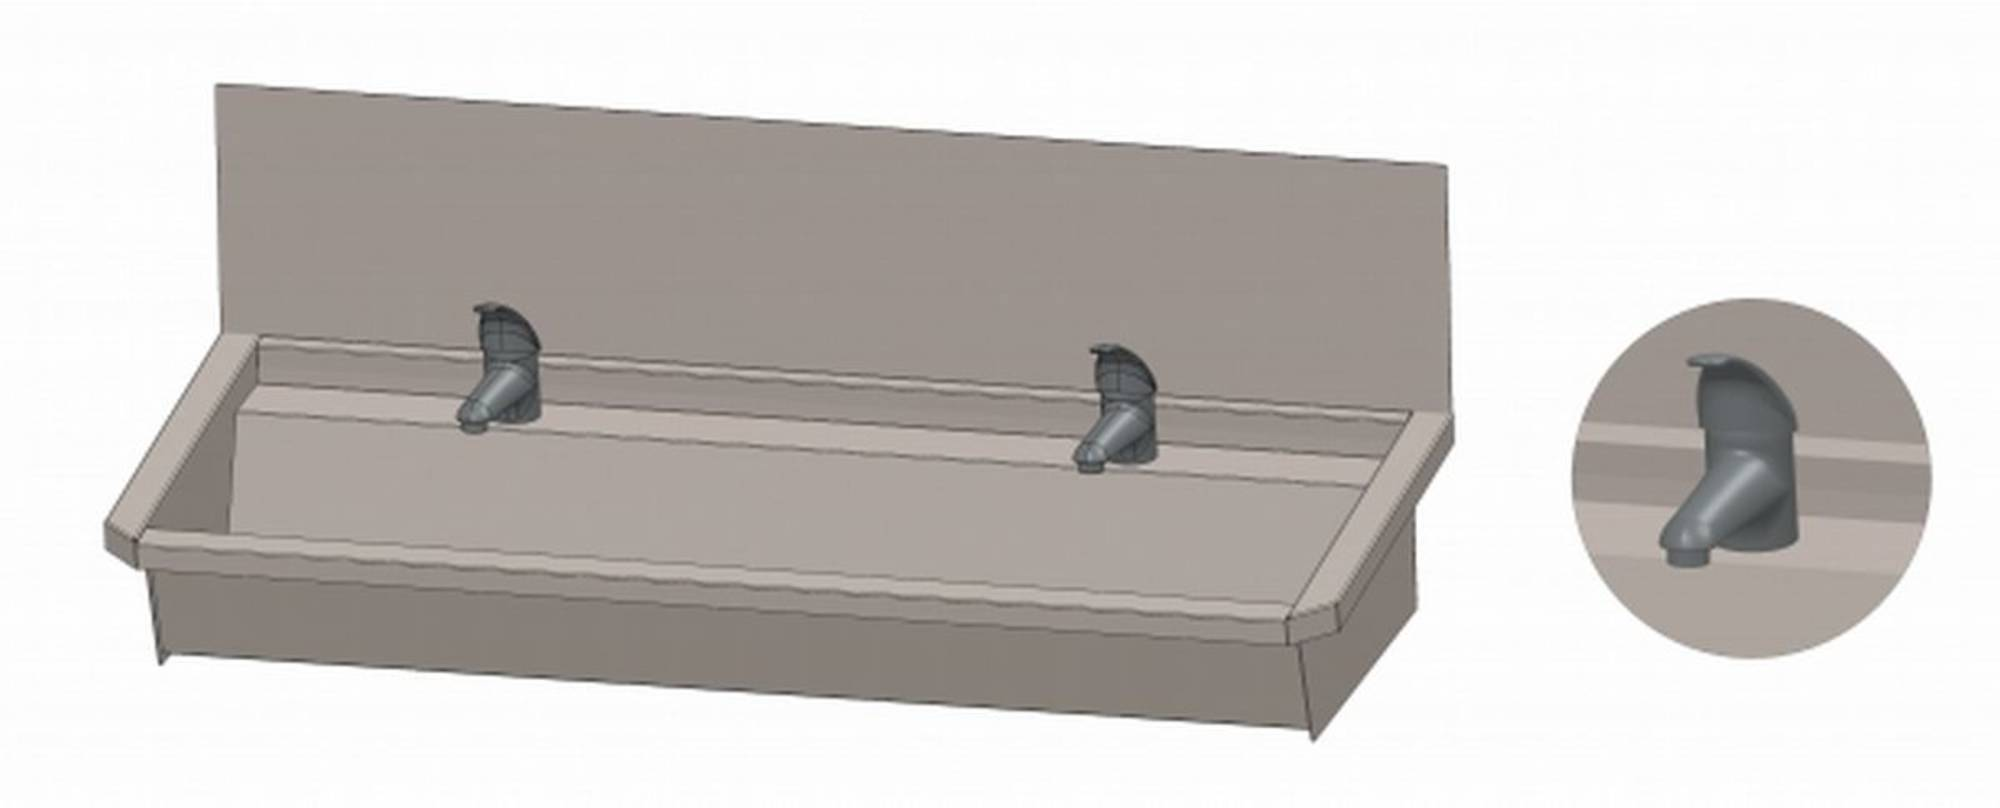 INTERSAN SANILAV wasgoot met spatbord 120 cm. met 2 1-greeps kranen INOX 304 (302L4)